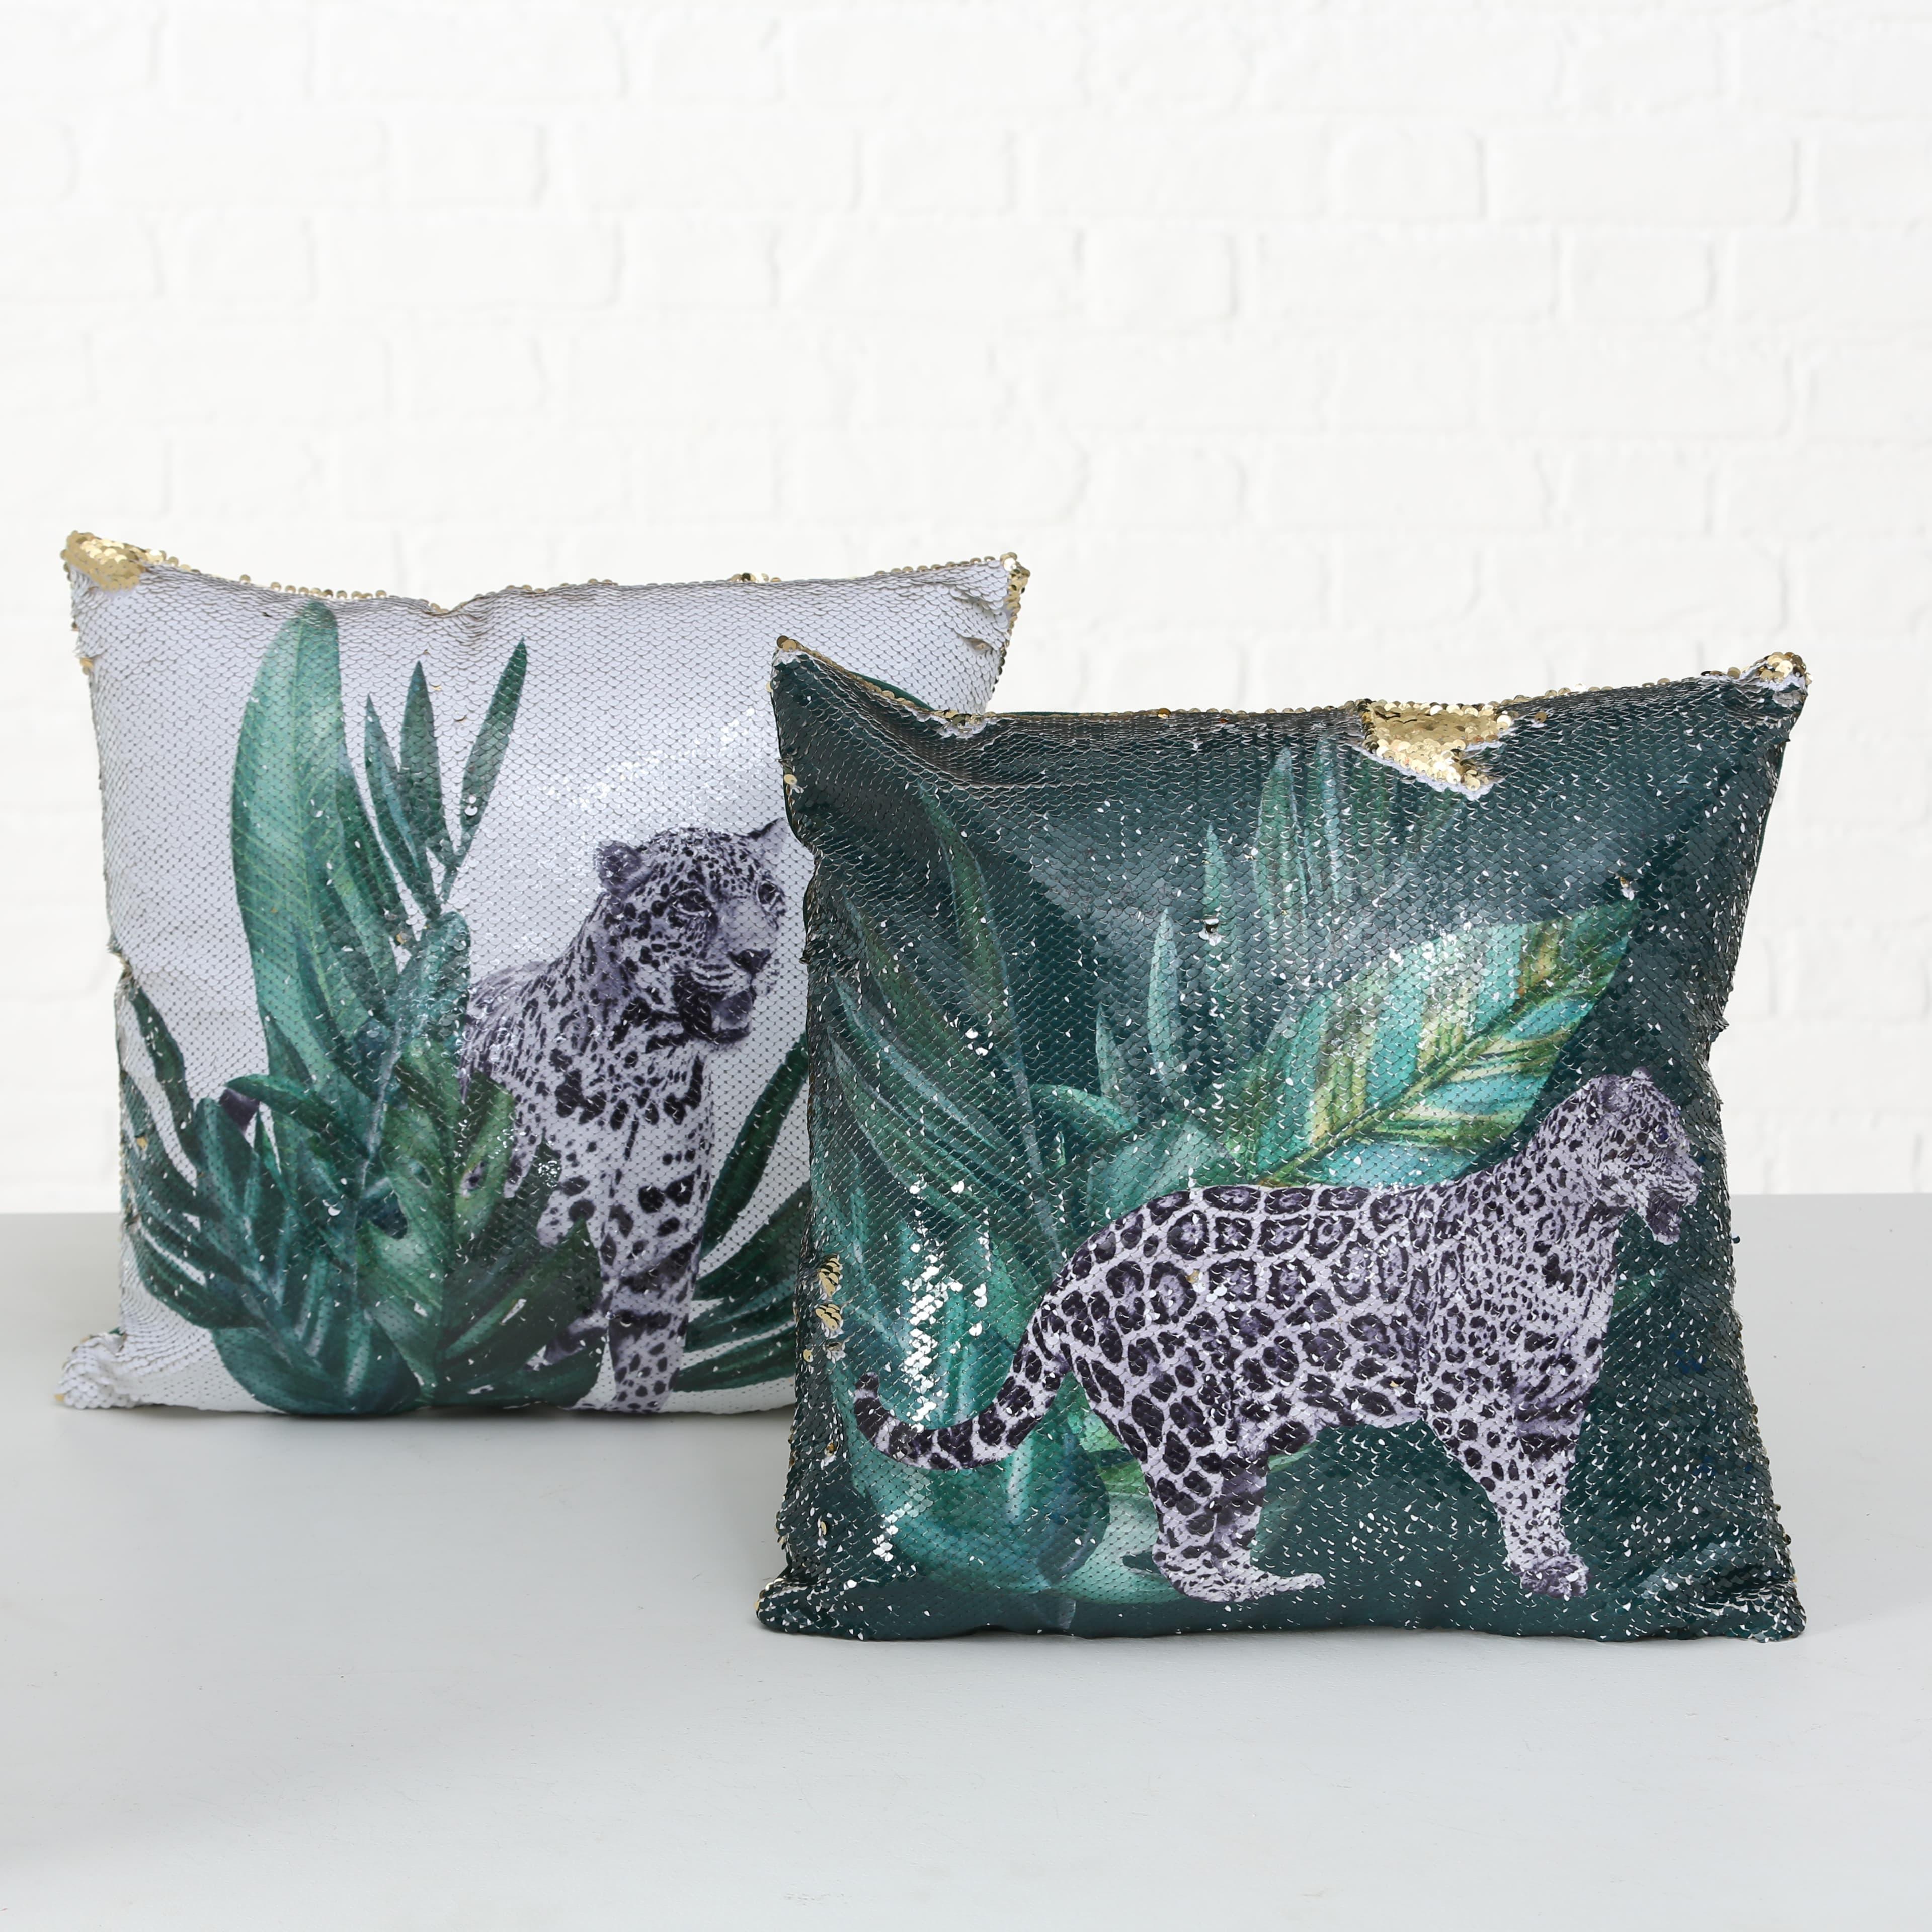 Perna decorativa Leopard Verde, Modele Asortate, L40xl40 cm imagine